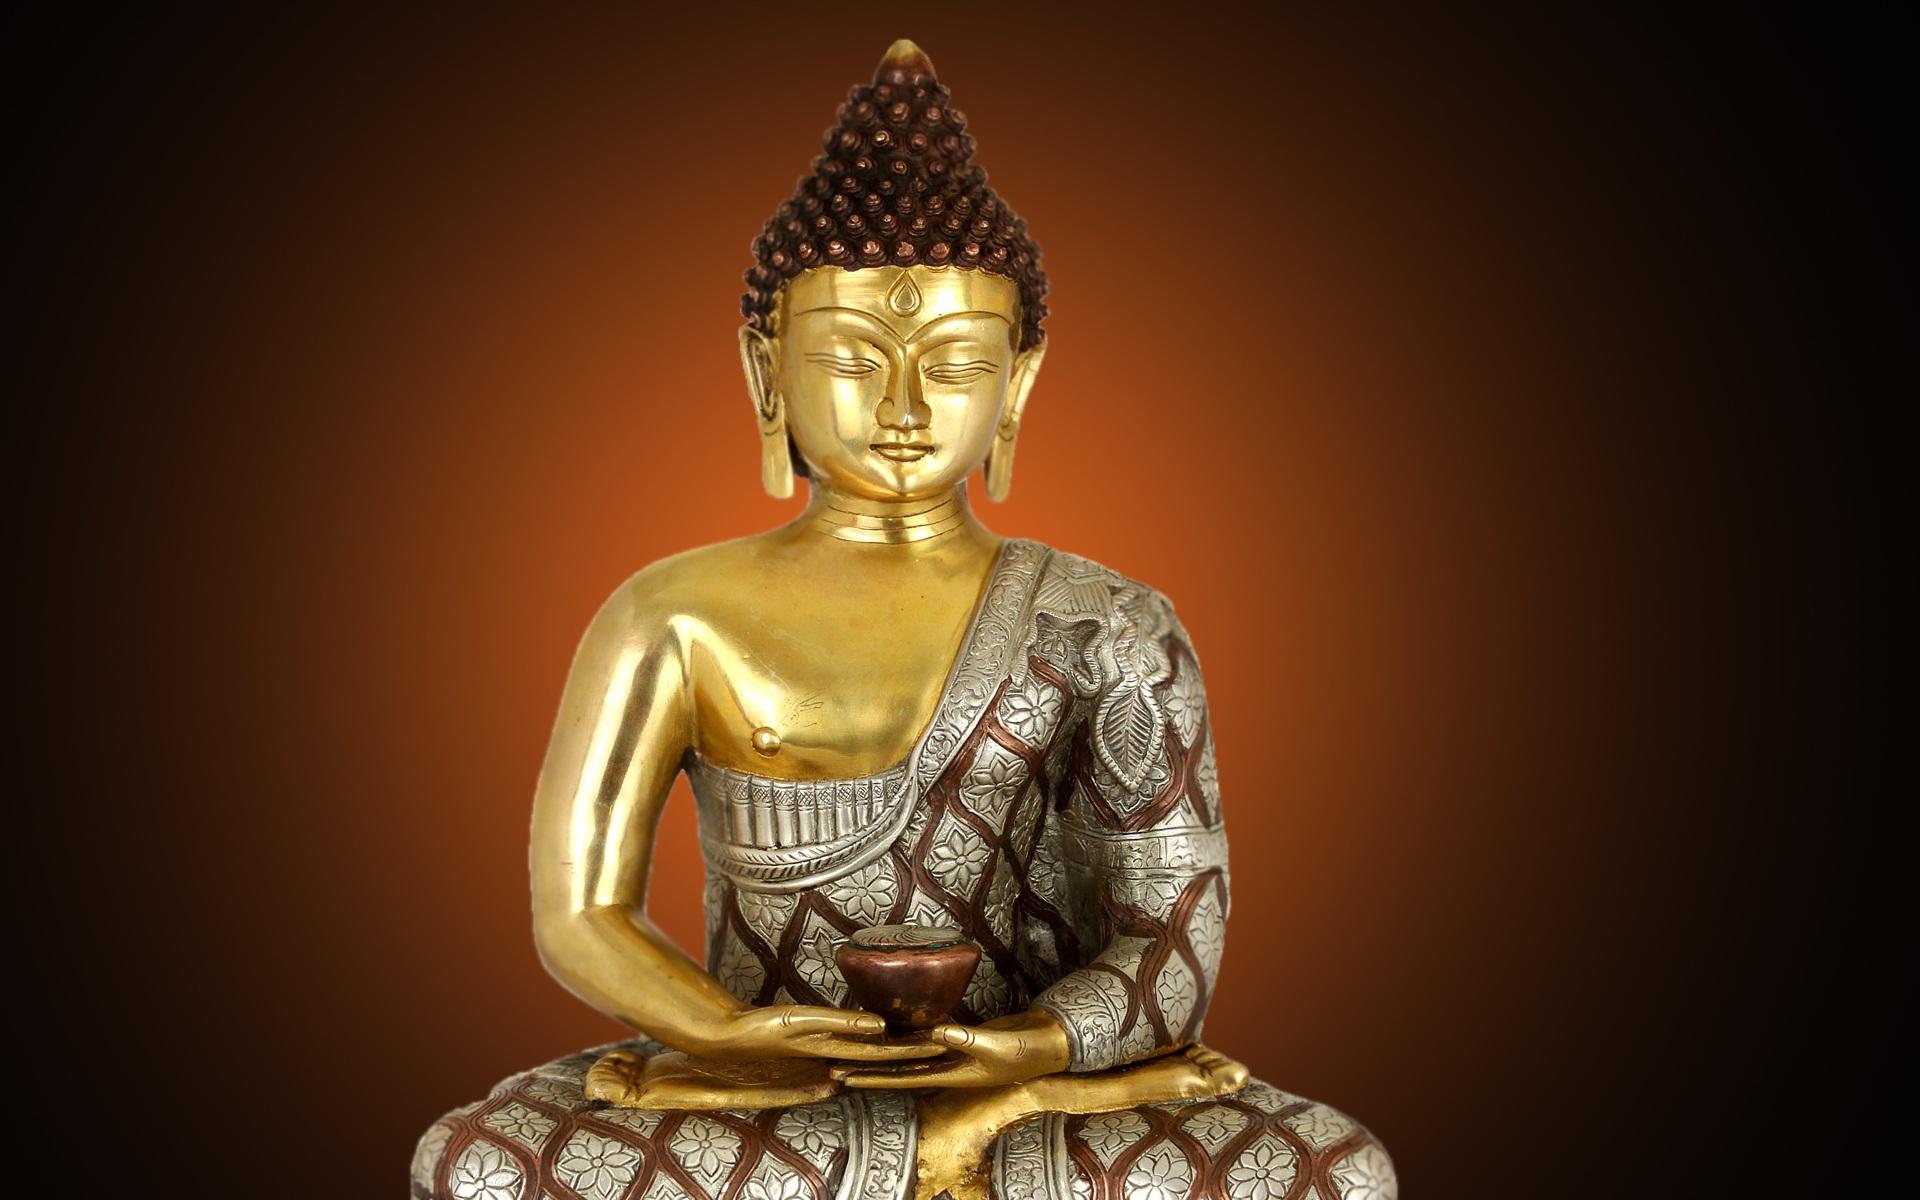 Gautam Buddha Images Lord Buddha Photos Pics & HD Wallpapers